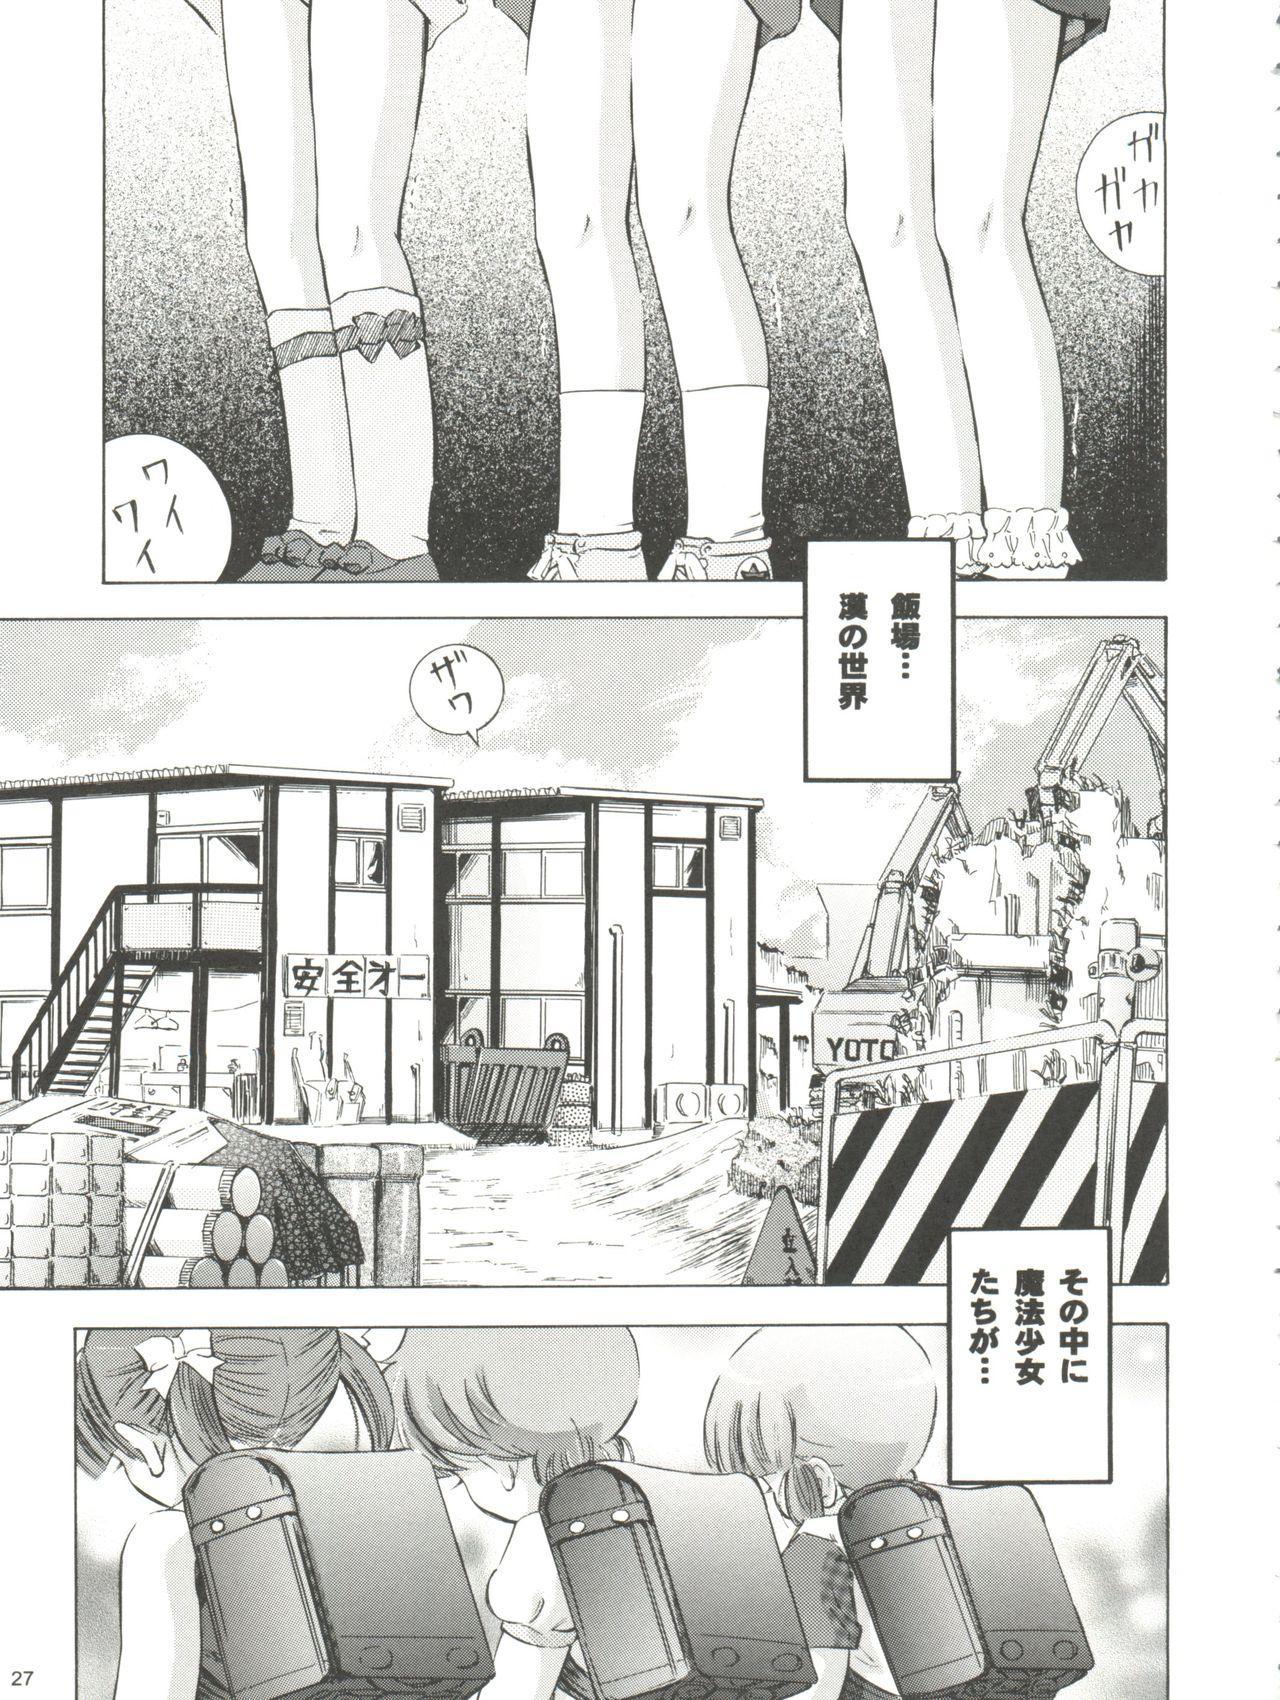 Mahou Kyuushiki 15 26